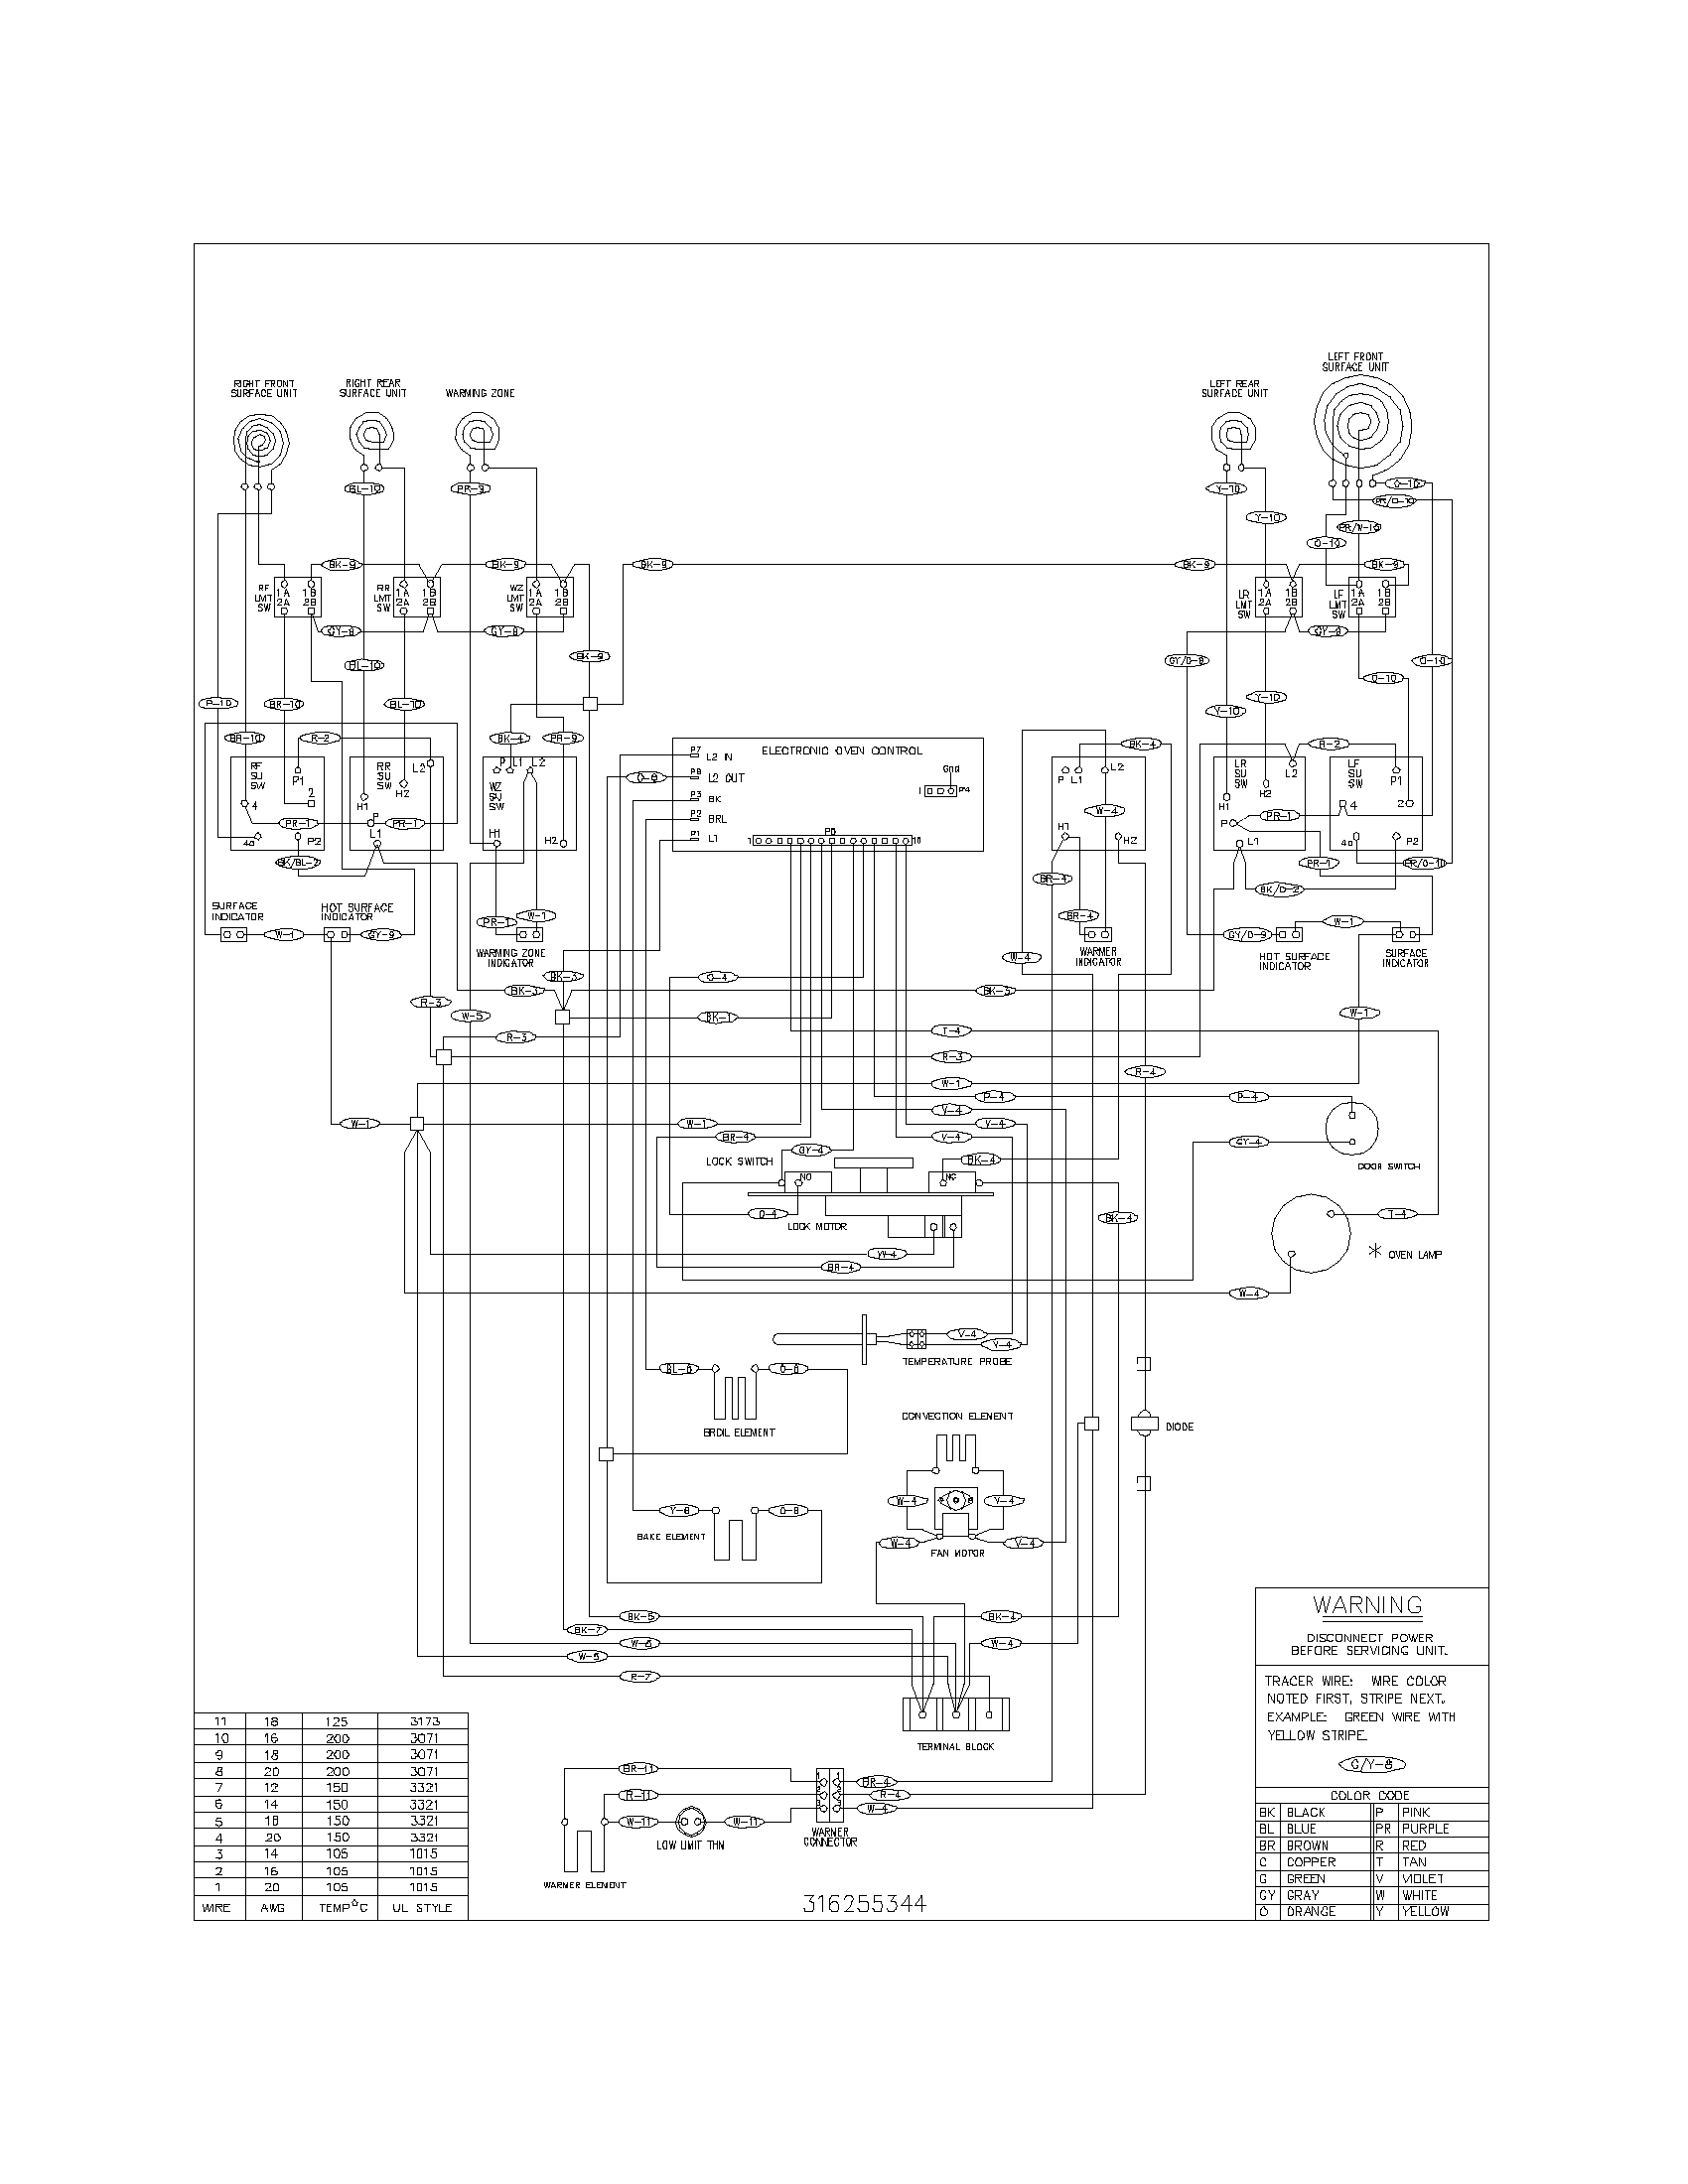 Service Wiring Diagram